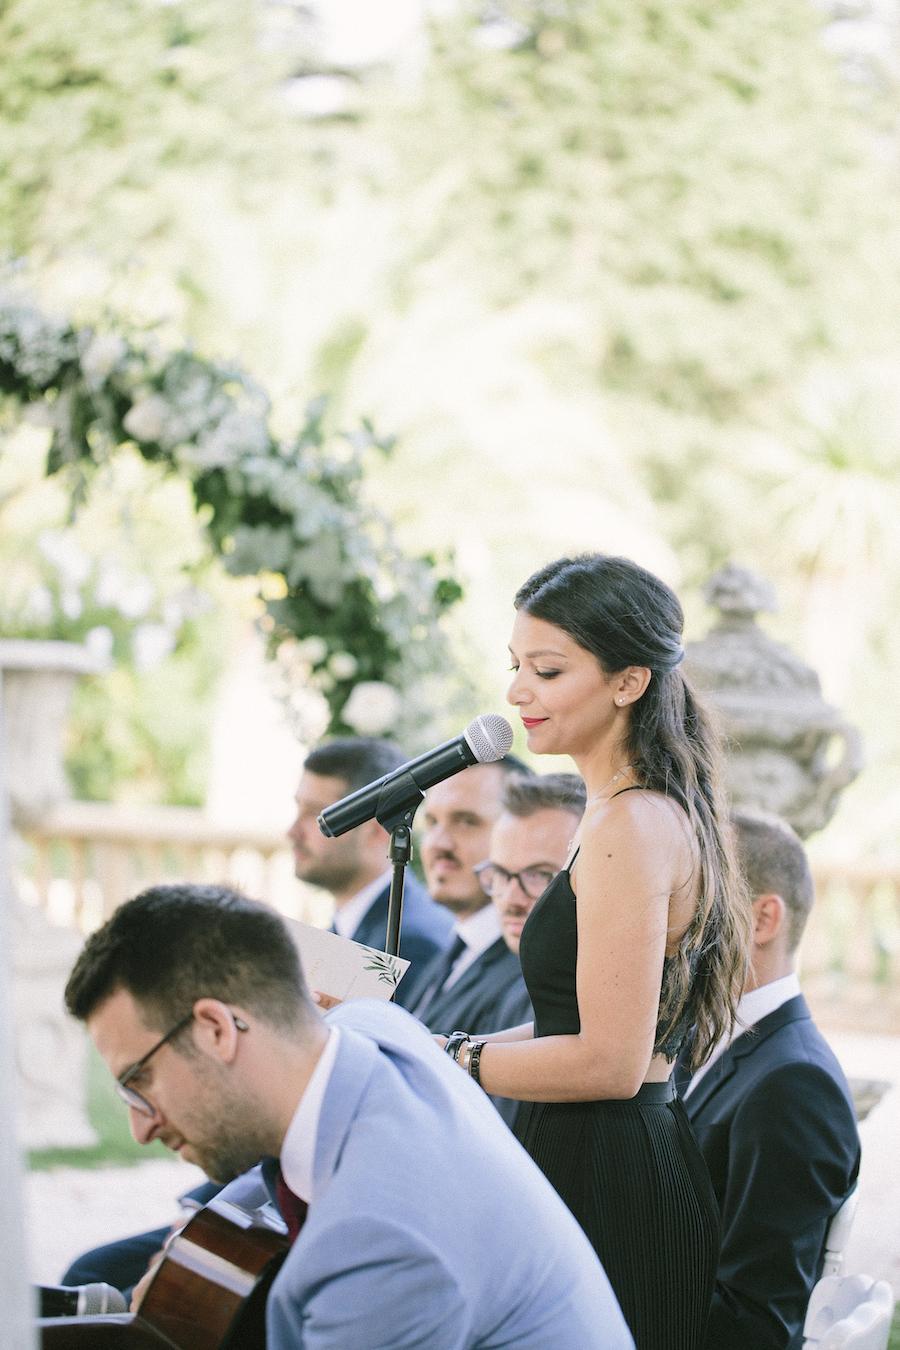 saya-photography-wedding-photographer-provence-chateau-de-robernier-64.jpg